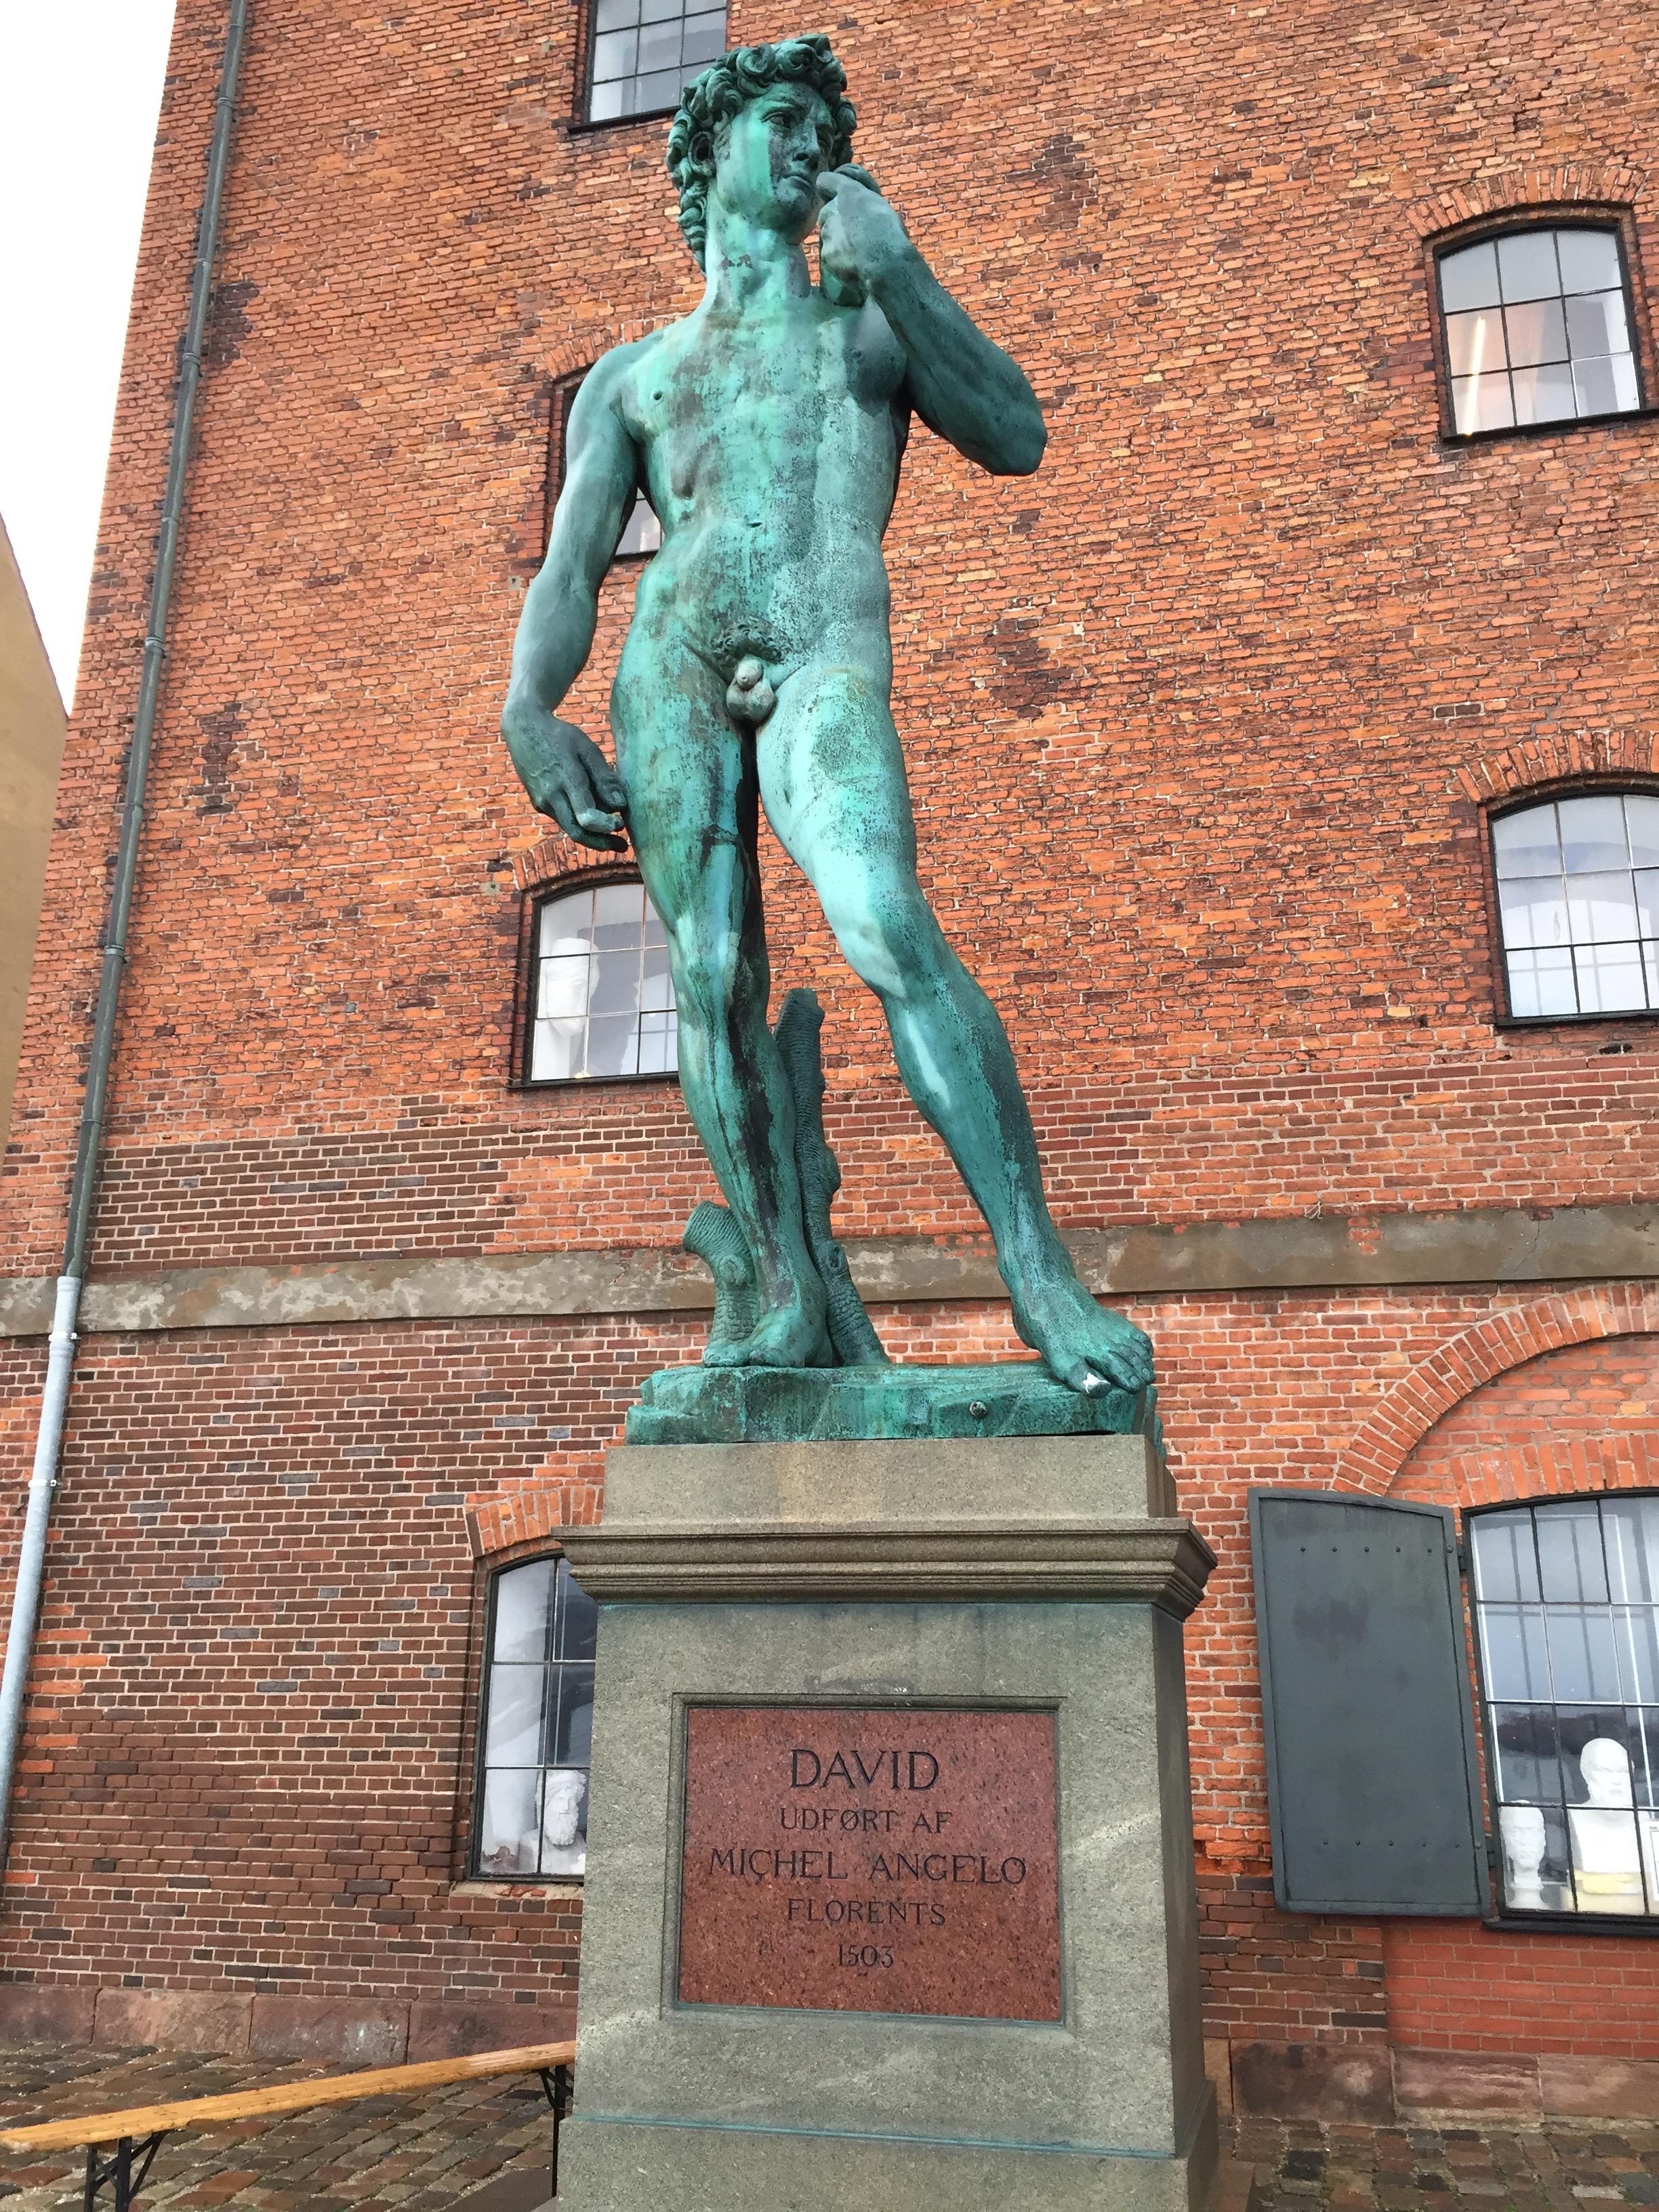 Replica of Michelangelo's  David. A bronze cast stands in front of the Kongelige Afstøbningssamling, the Danish Royal Cast Collection at the  Langelinie Promenade in Copenhagen.